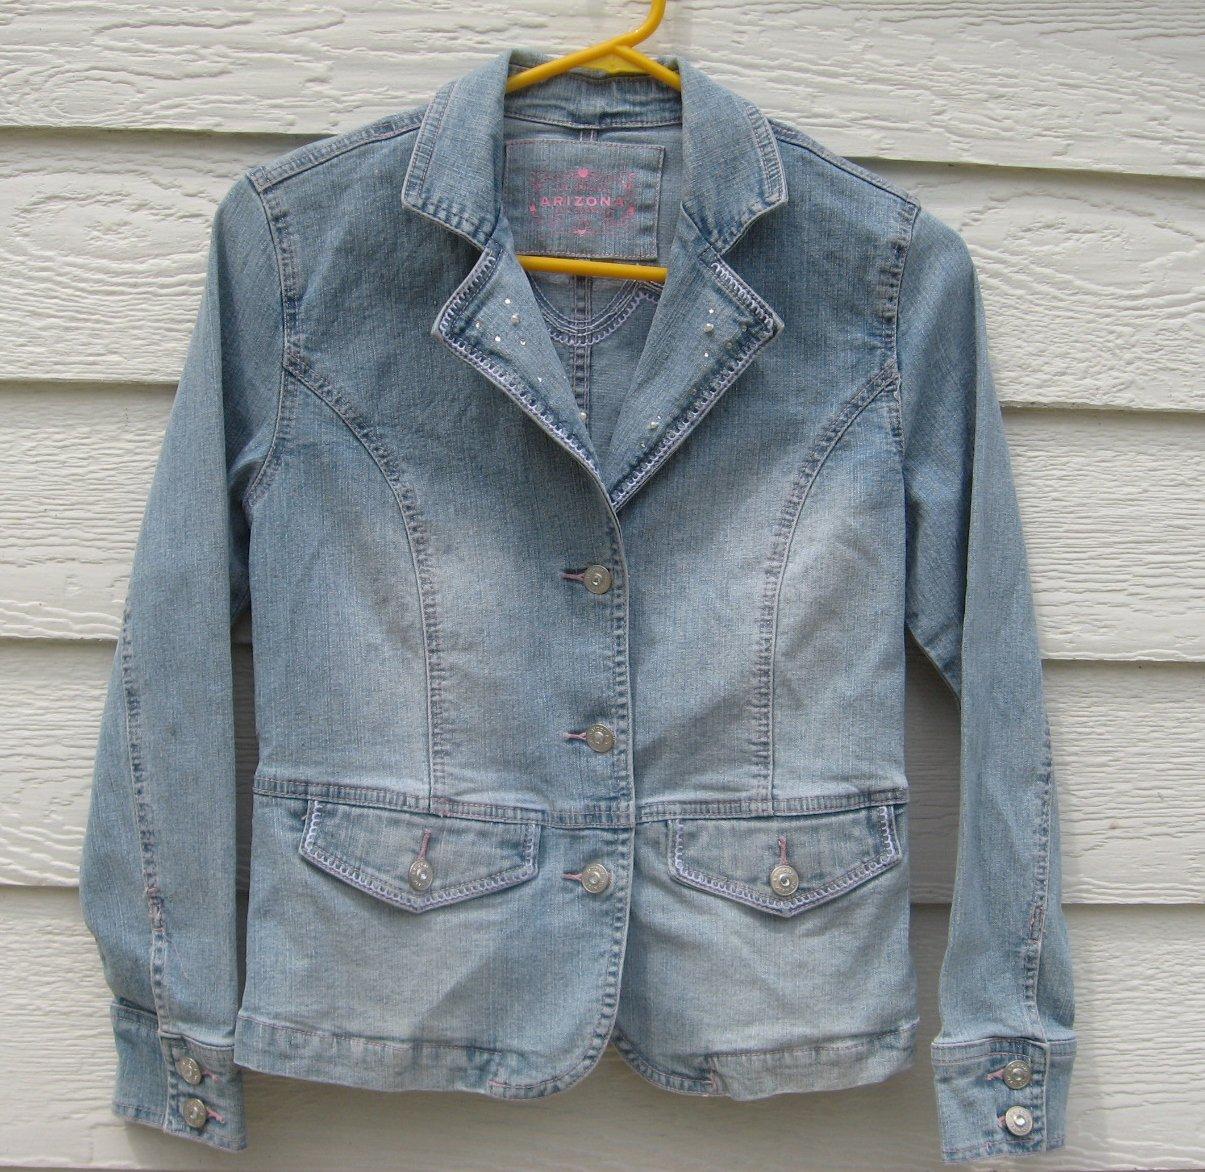 Arizona Denim Blazer Jacket Jr Large 32 Chest Embroidered Pearls Blue Jean